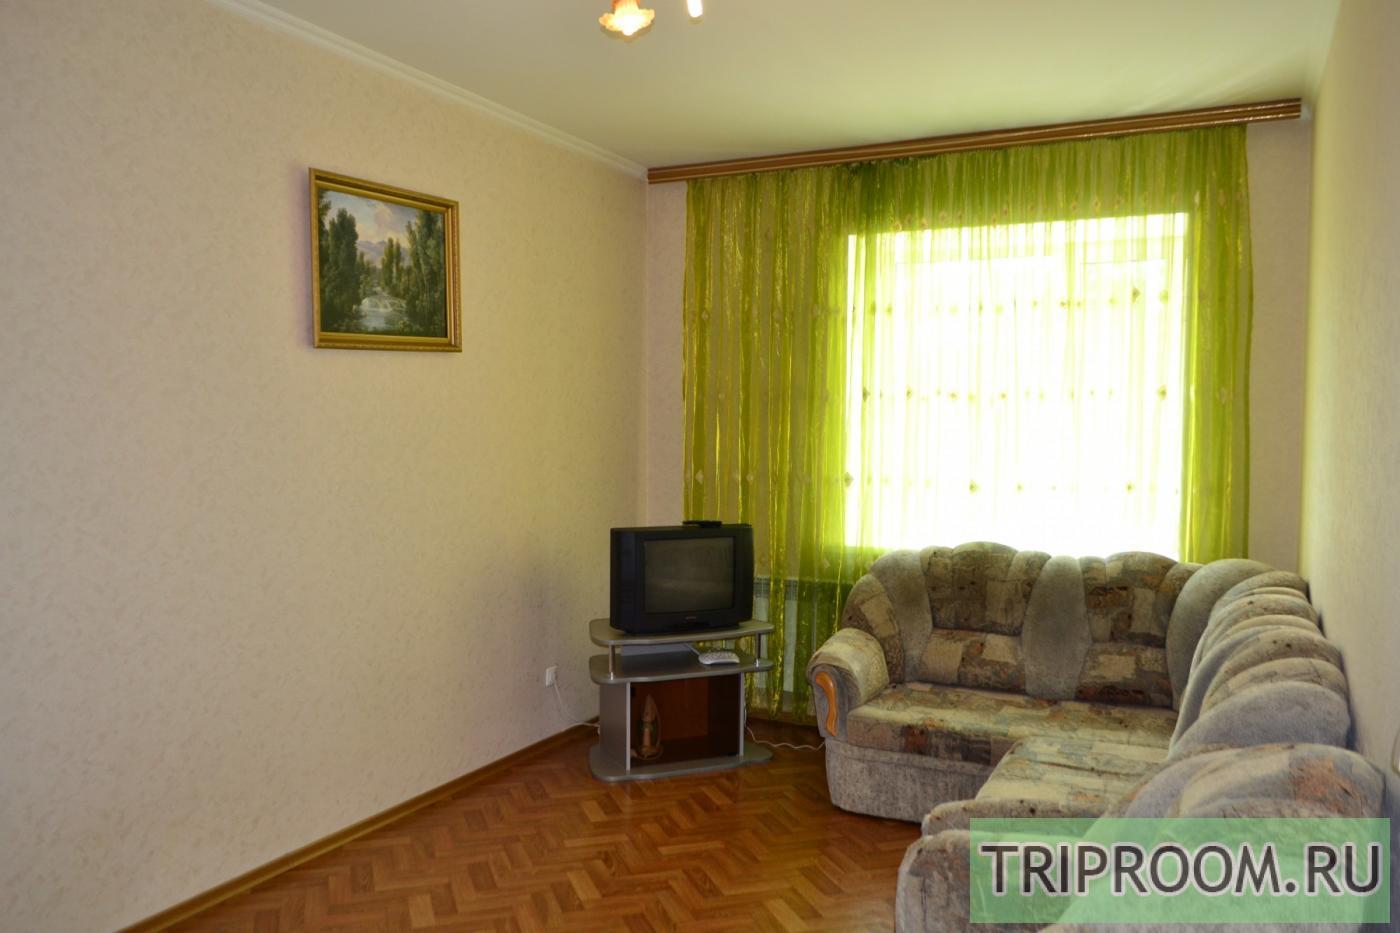 1-комнатная квартира посуточно (вариант № 12444), ул. Рихарда Зорге улица, фото № 3